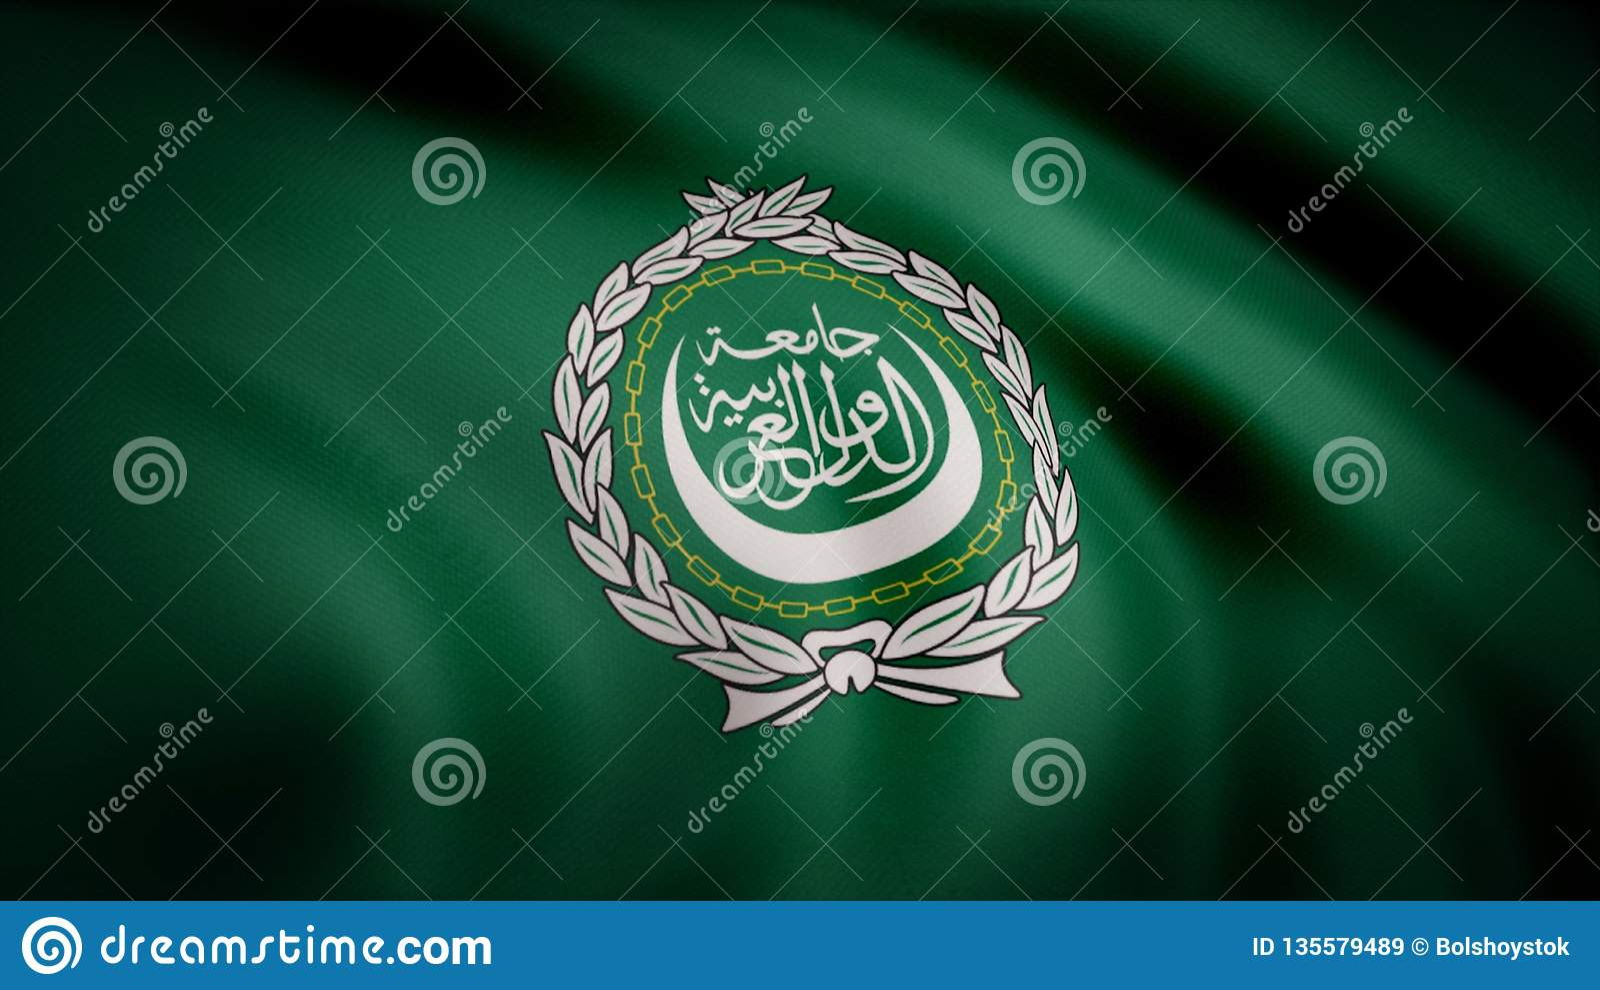 Arab League flag waving seamless loop. Arab League loopable flag with highly detailed fabric texture. League of Arabian